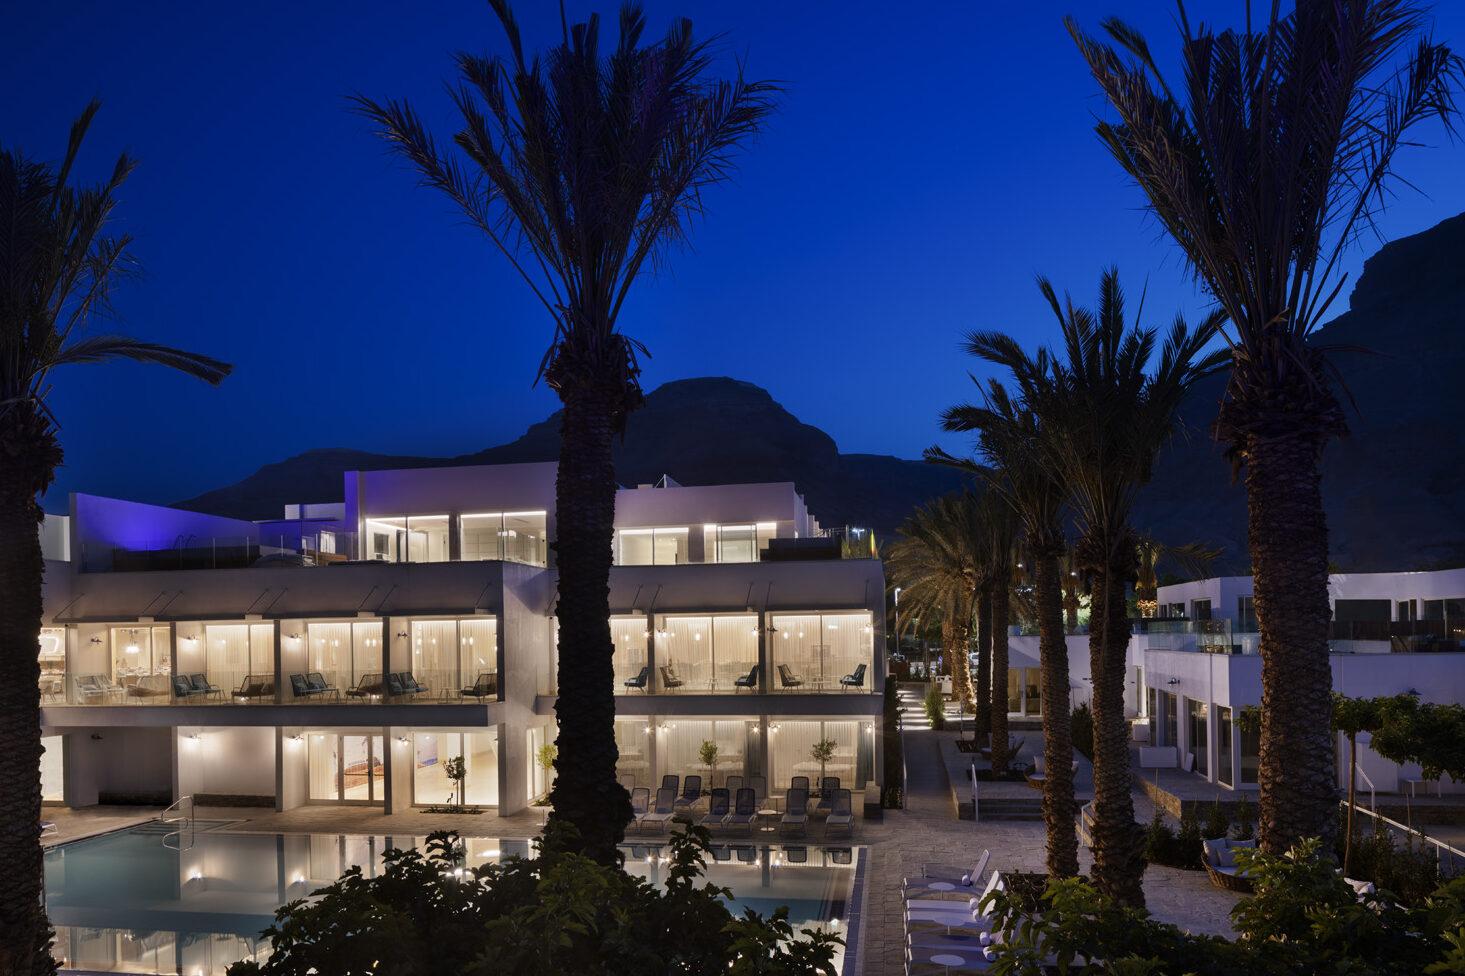 HOTEL HERBERT SAMUEL MILOS – DEAD SEA